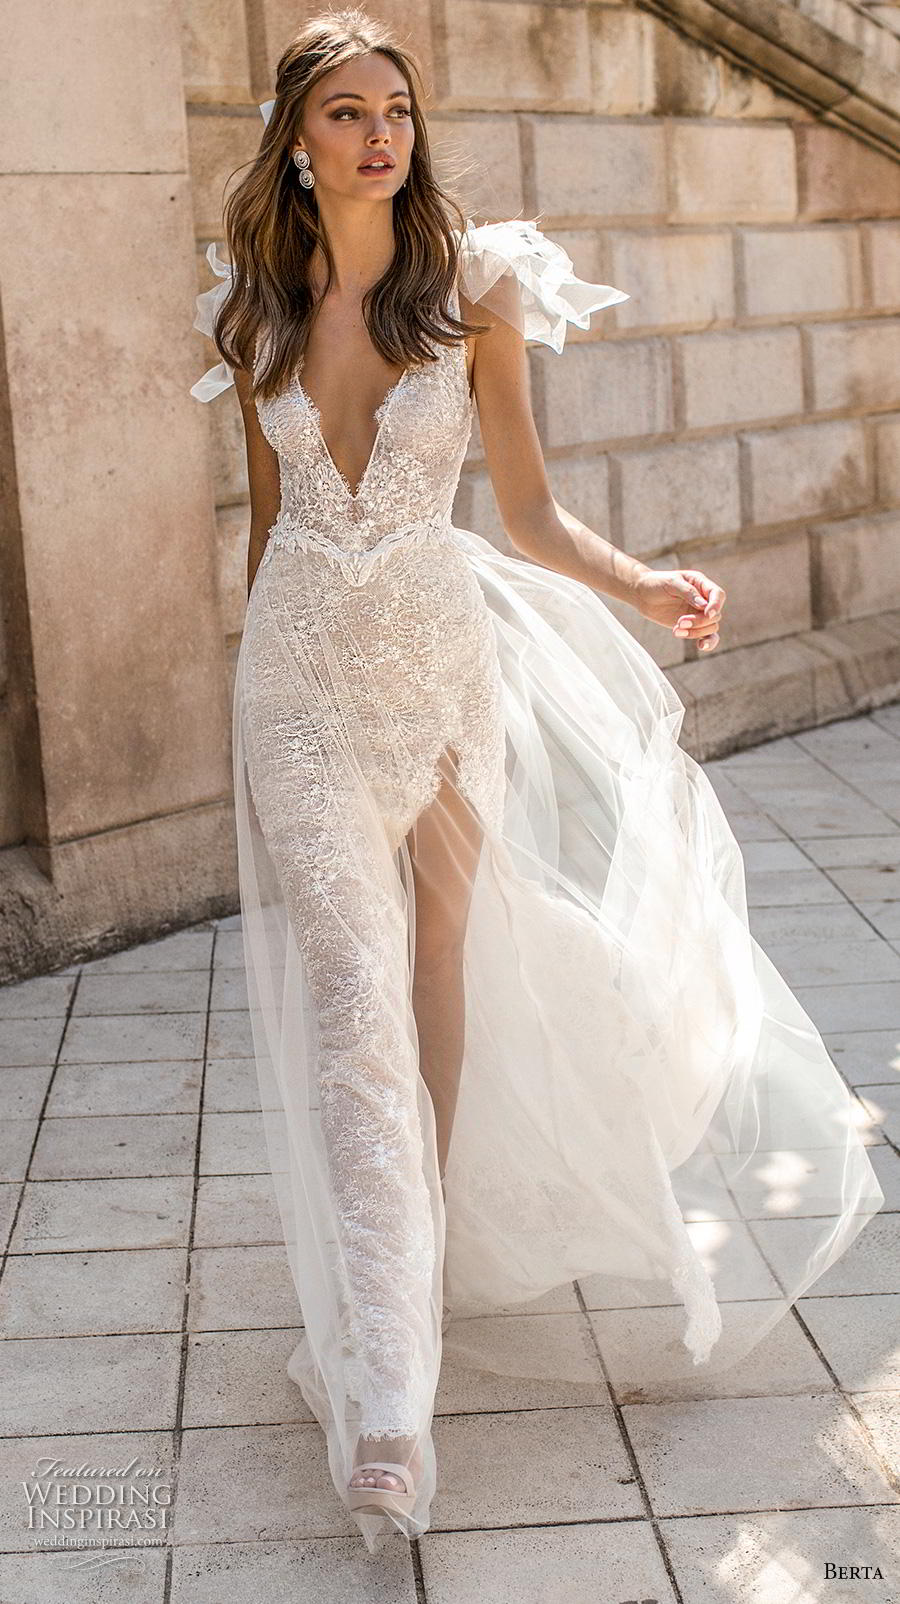 berta fall 2019 muse bridal cap sleeves deep v neck full embellishment slit skirt glitzy glamorous elegant sheath wedding dress backless sweep train (6) mv